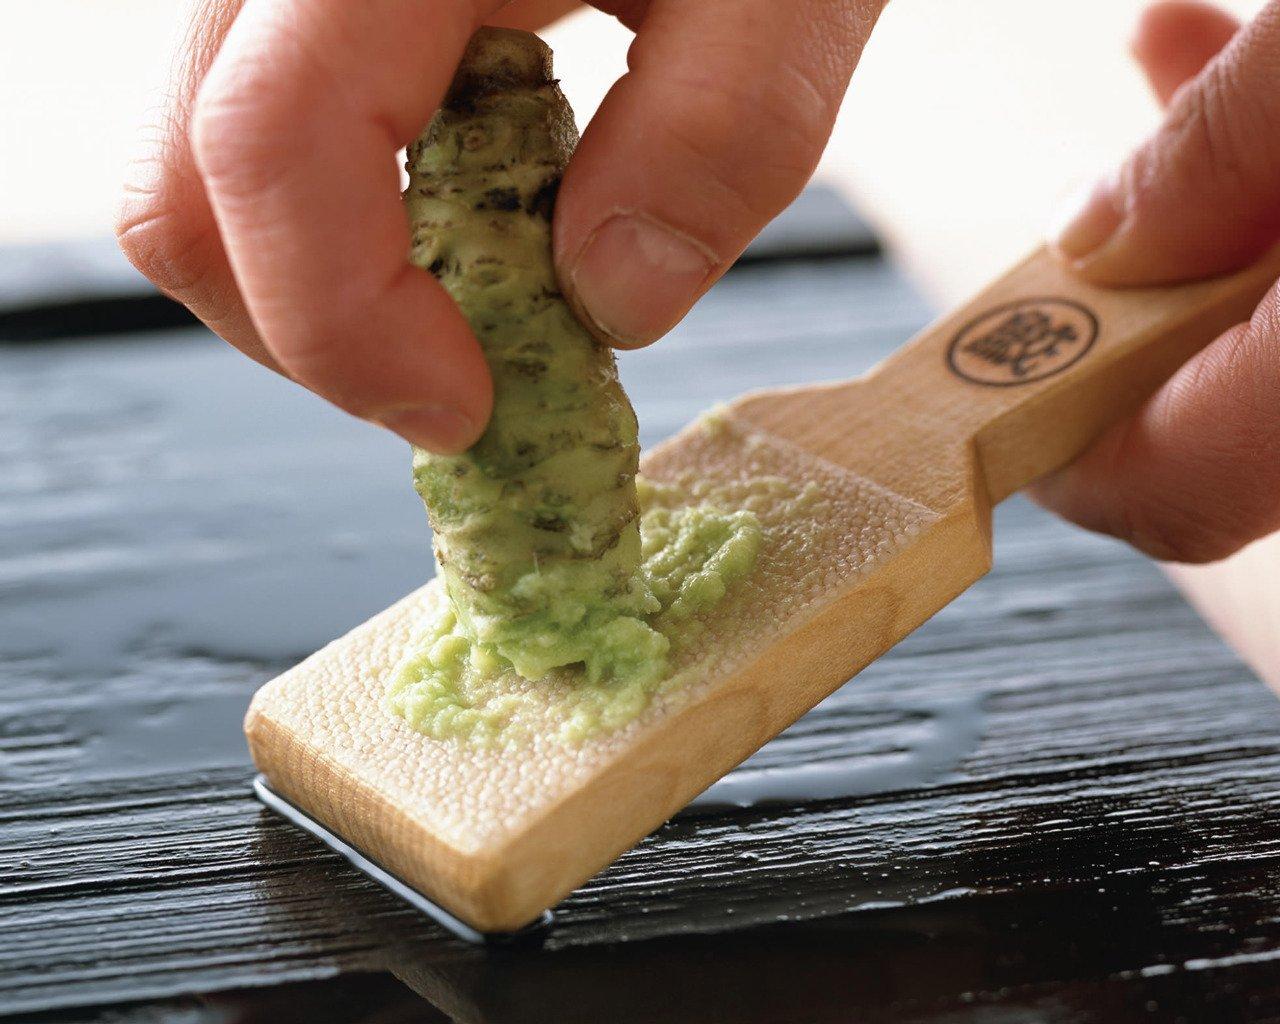 Japanese wasabi maker